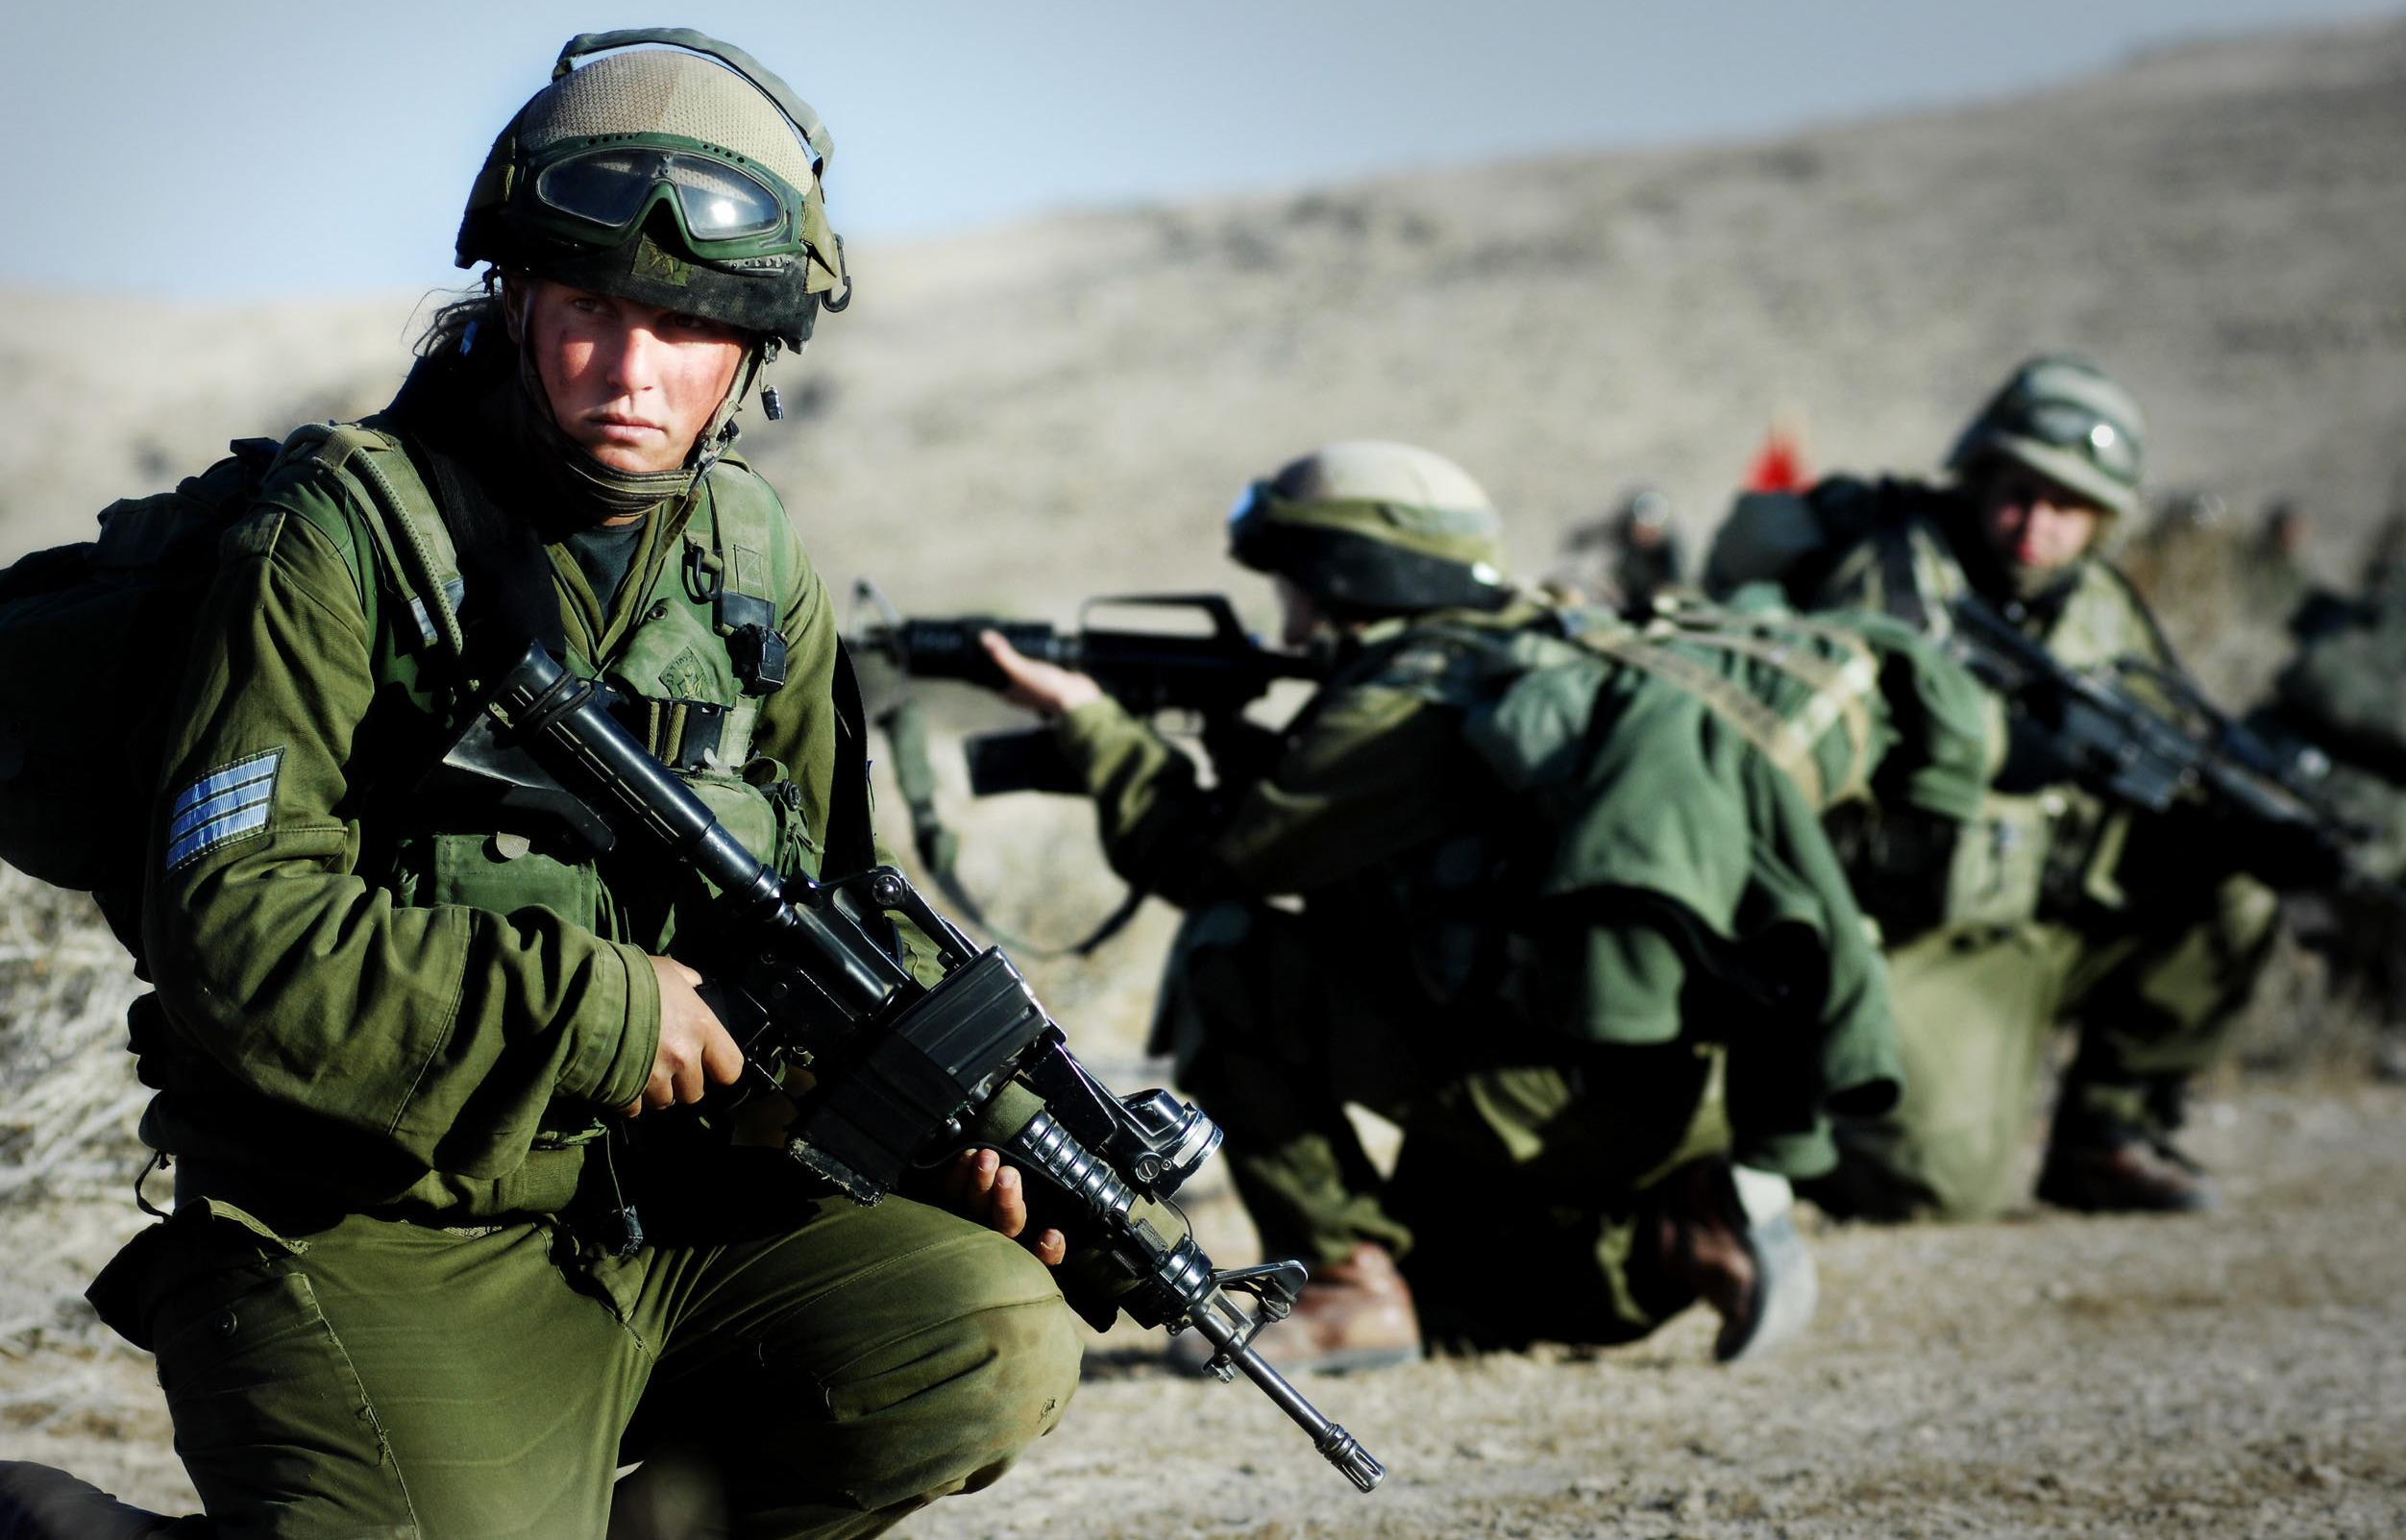 File:Flickr - Israel Defense Forces - Karakal Winter Training.jpg - Wikimedia Commons